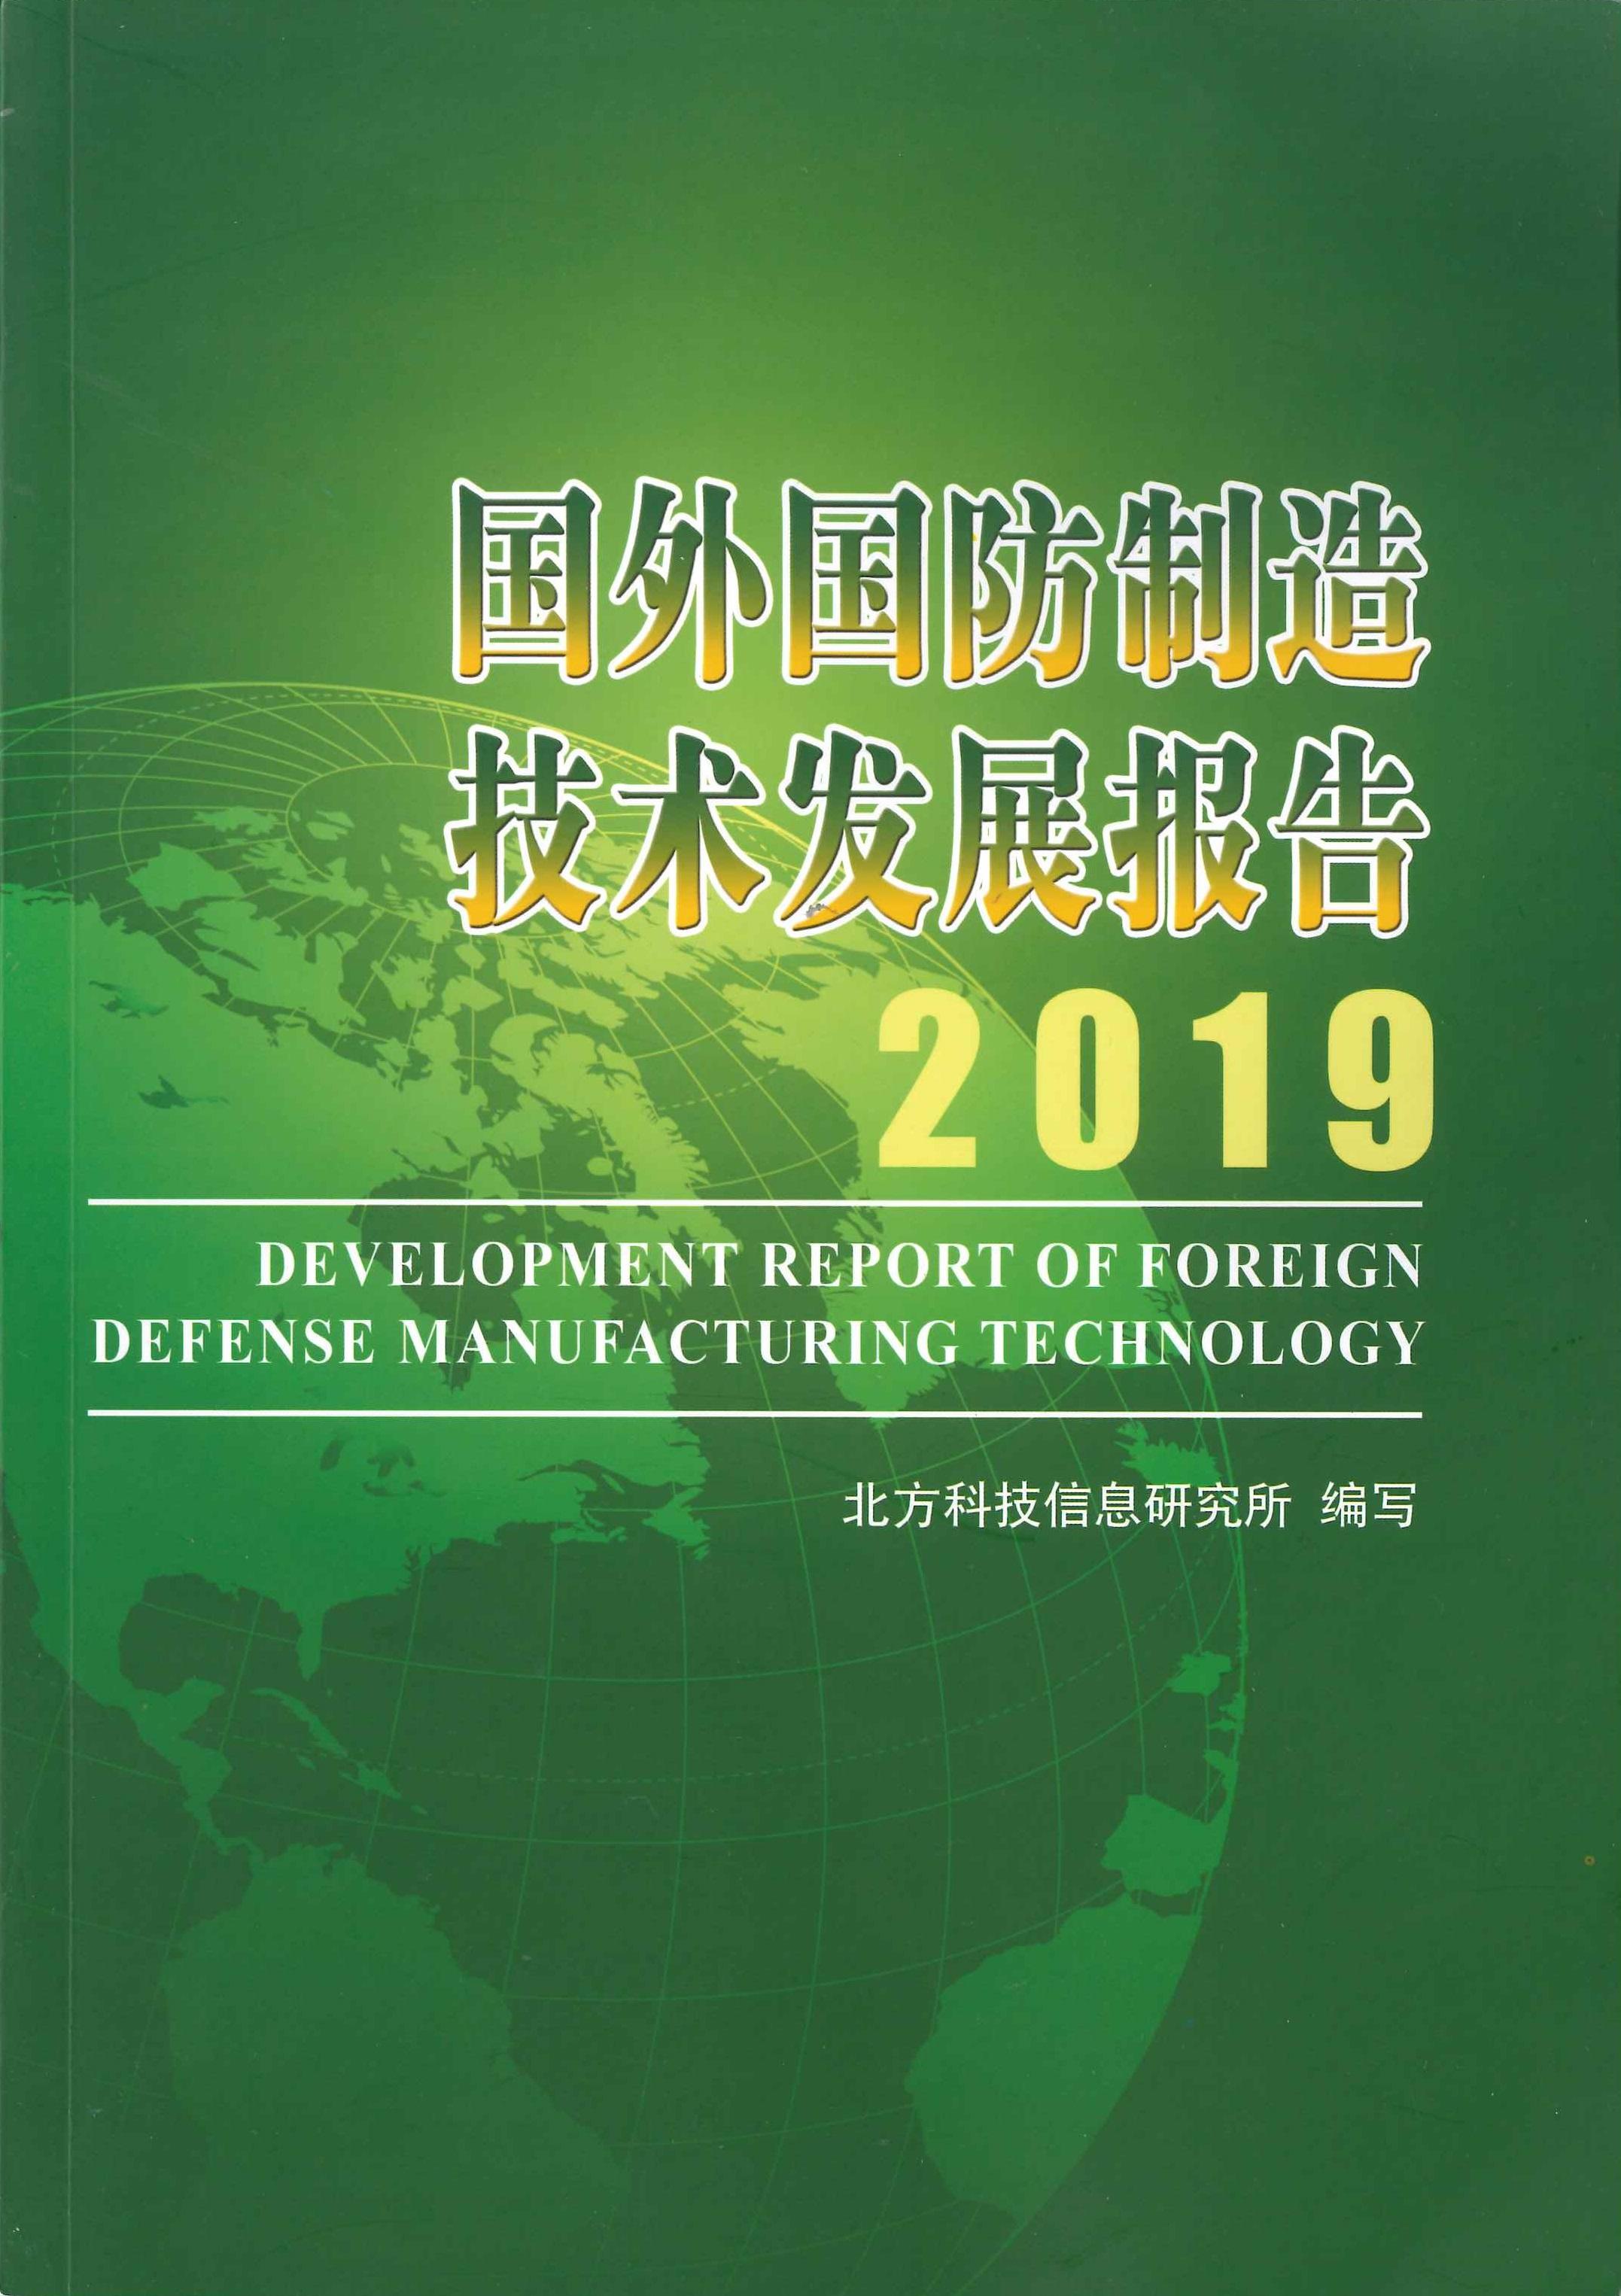 国外国防制造技术发展报告.2019=Development report of foreign defense manufacturing technology